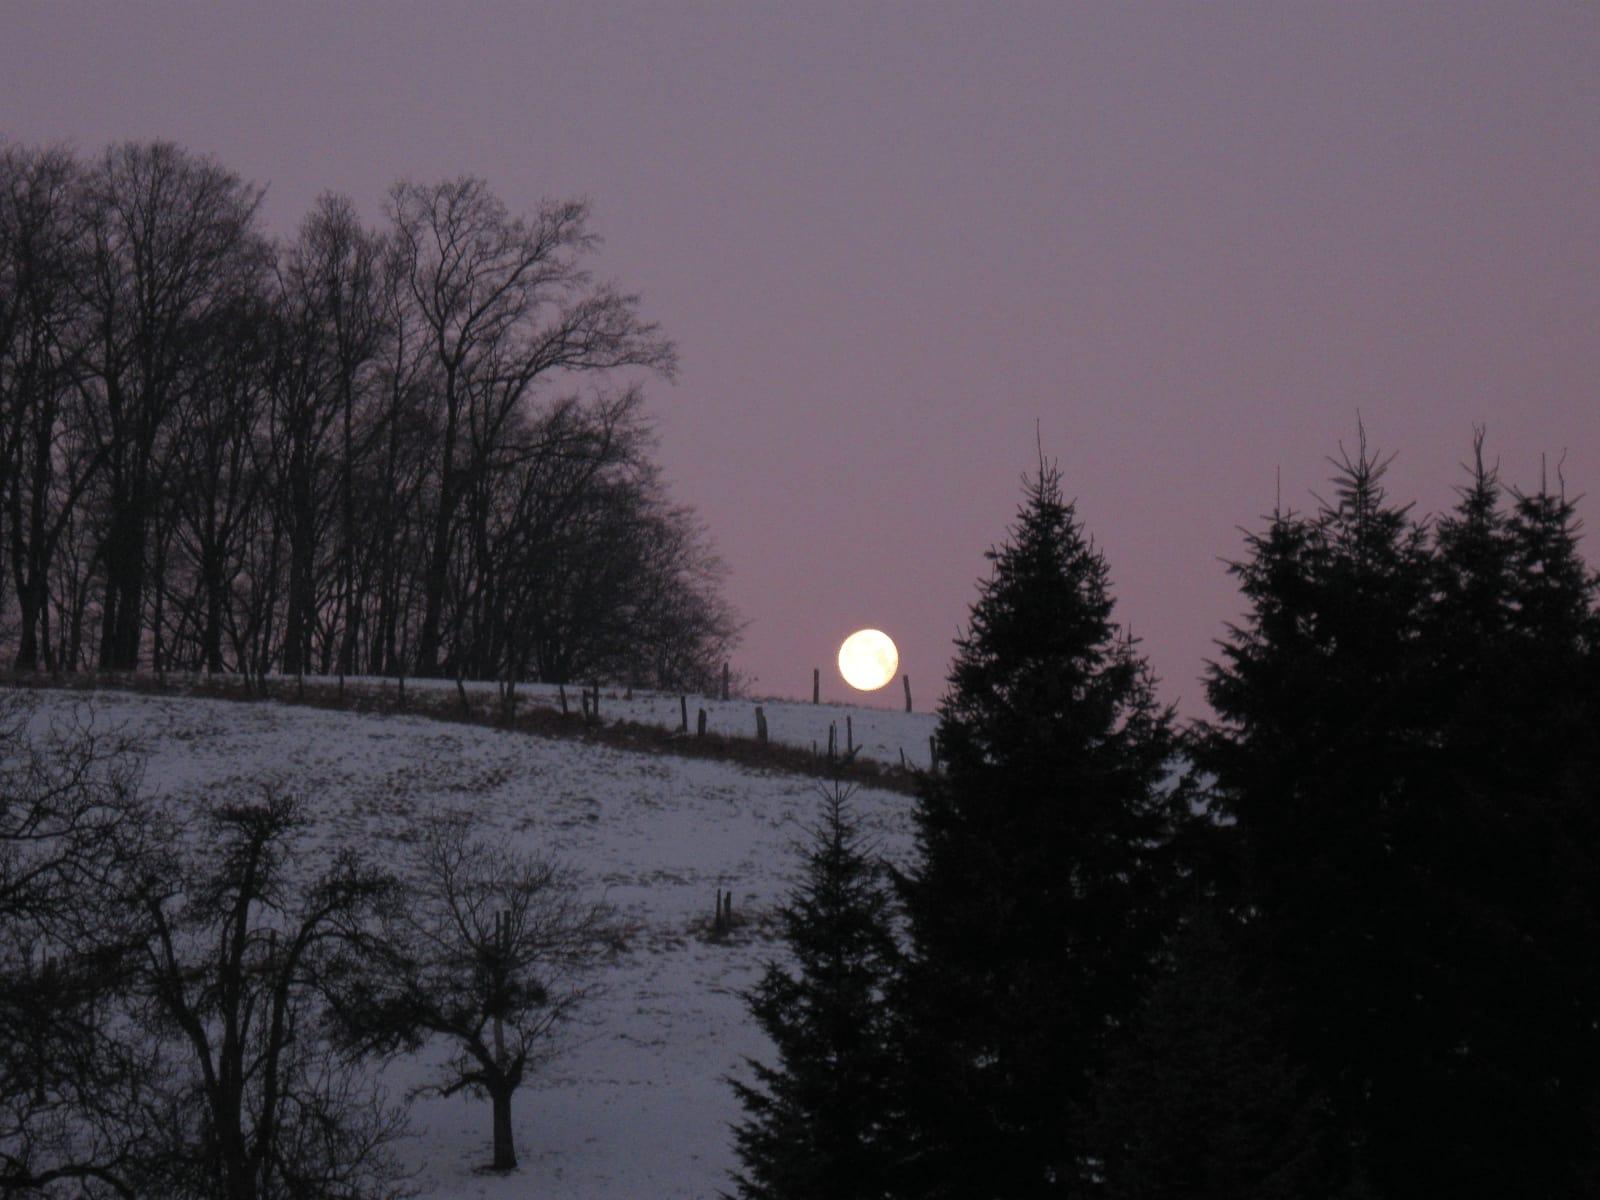 Craniosacral Healing Ausbildung Vöckelsbach Vollmond im Winter